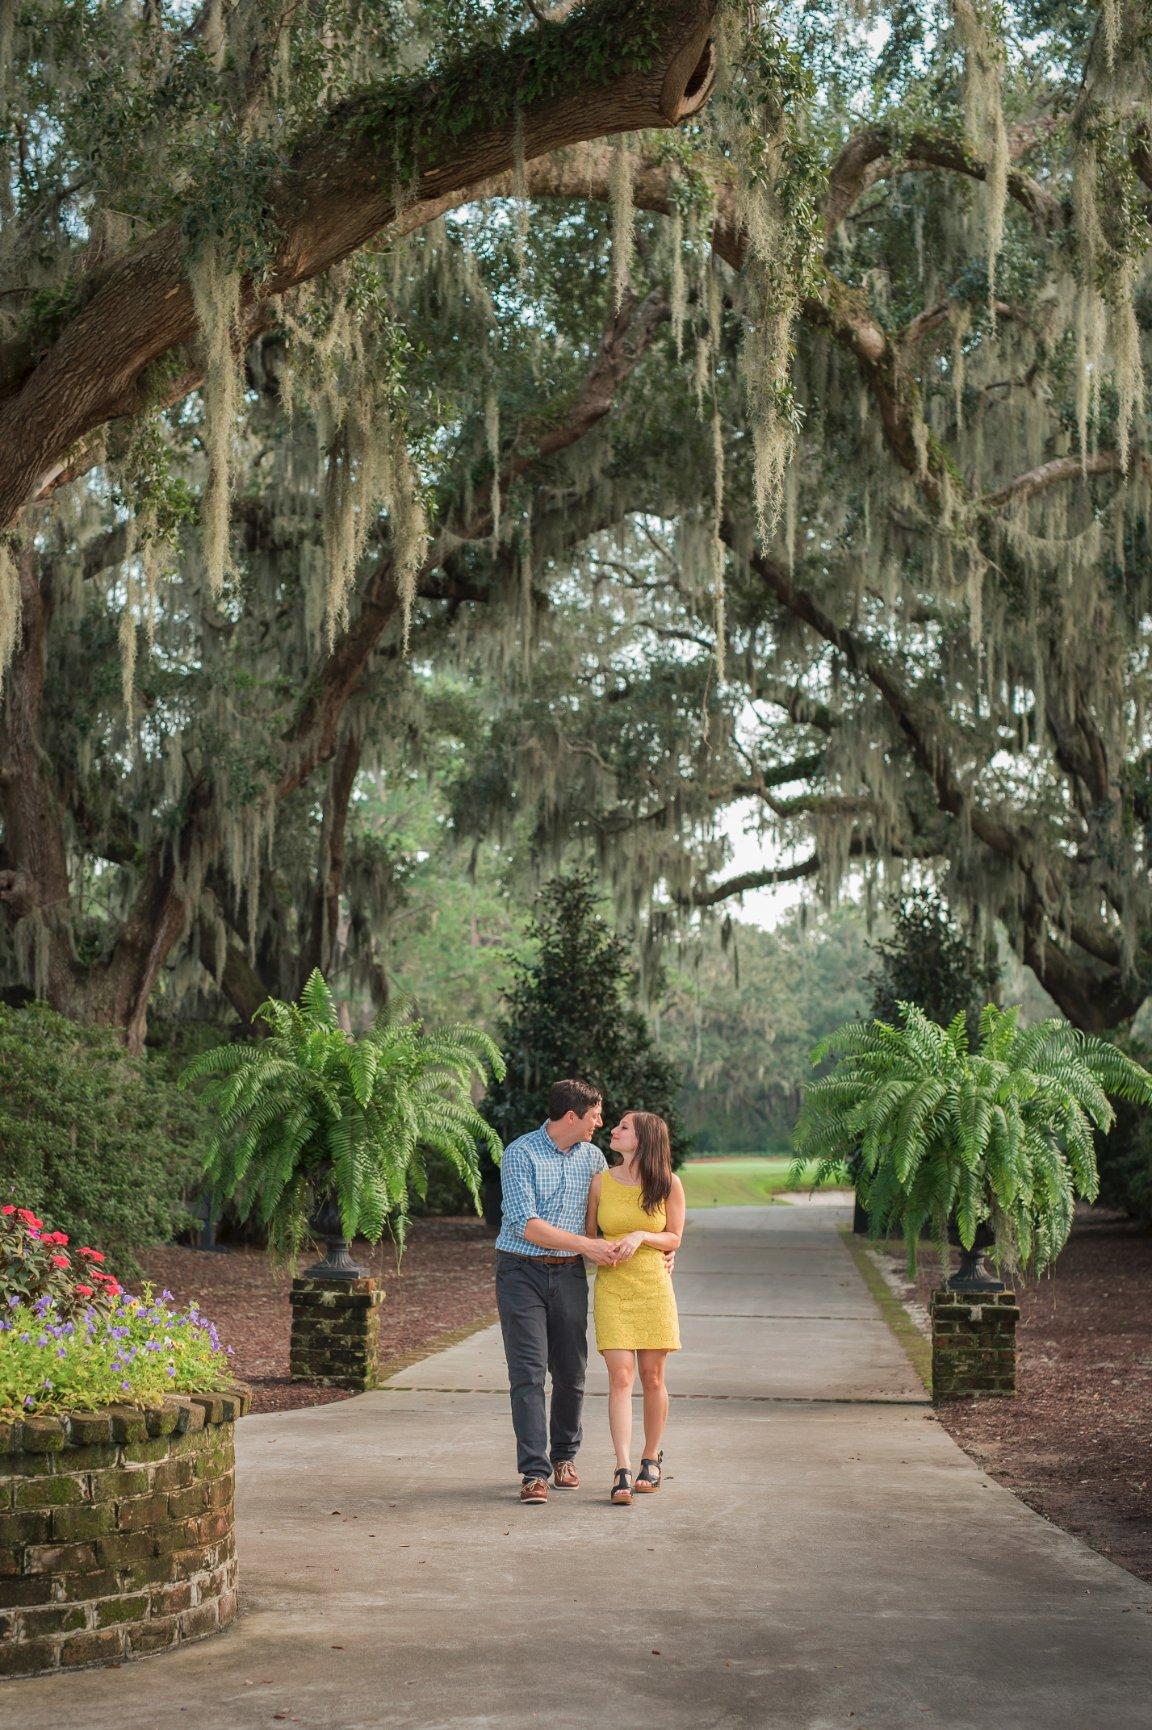 Myrtle Beach Wedding & Portrait photographer Michele Coleman